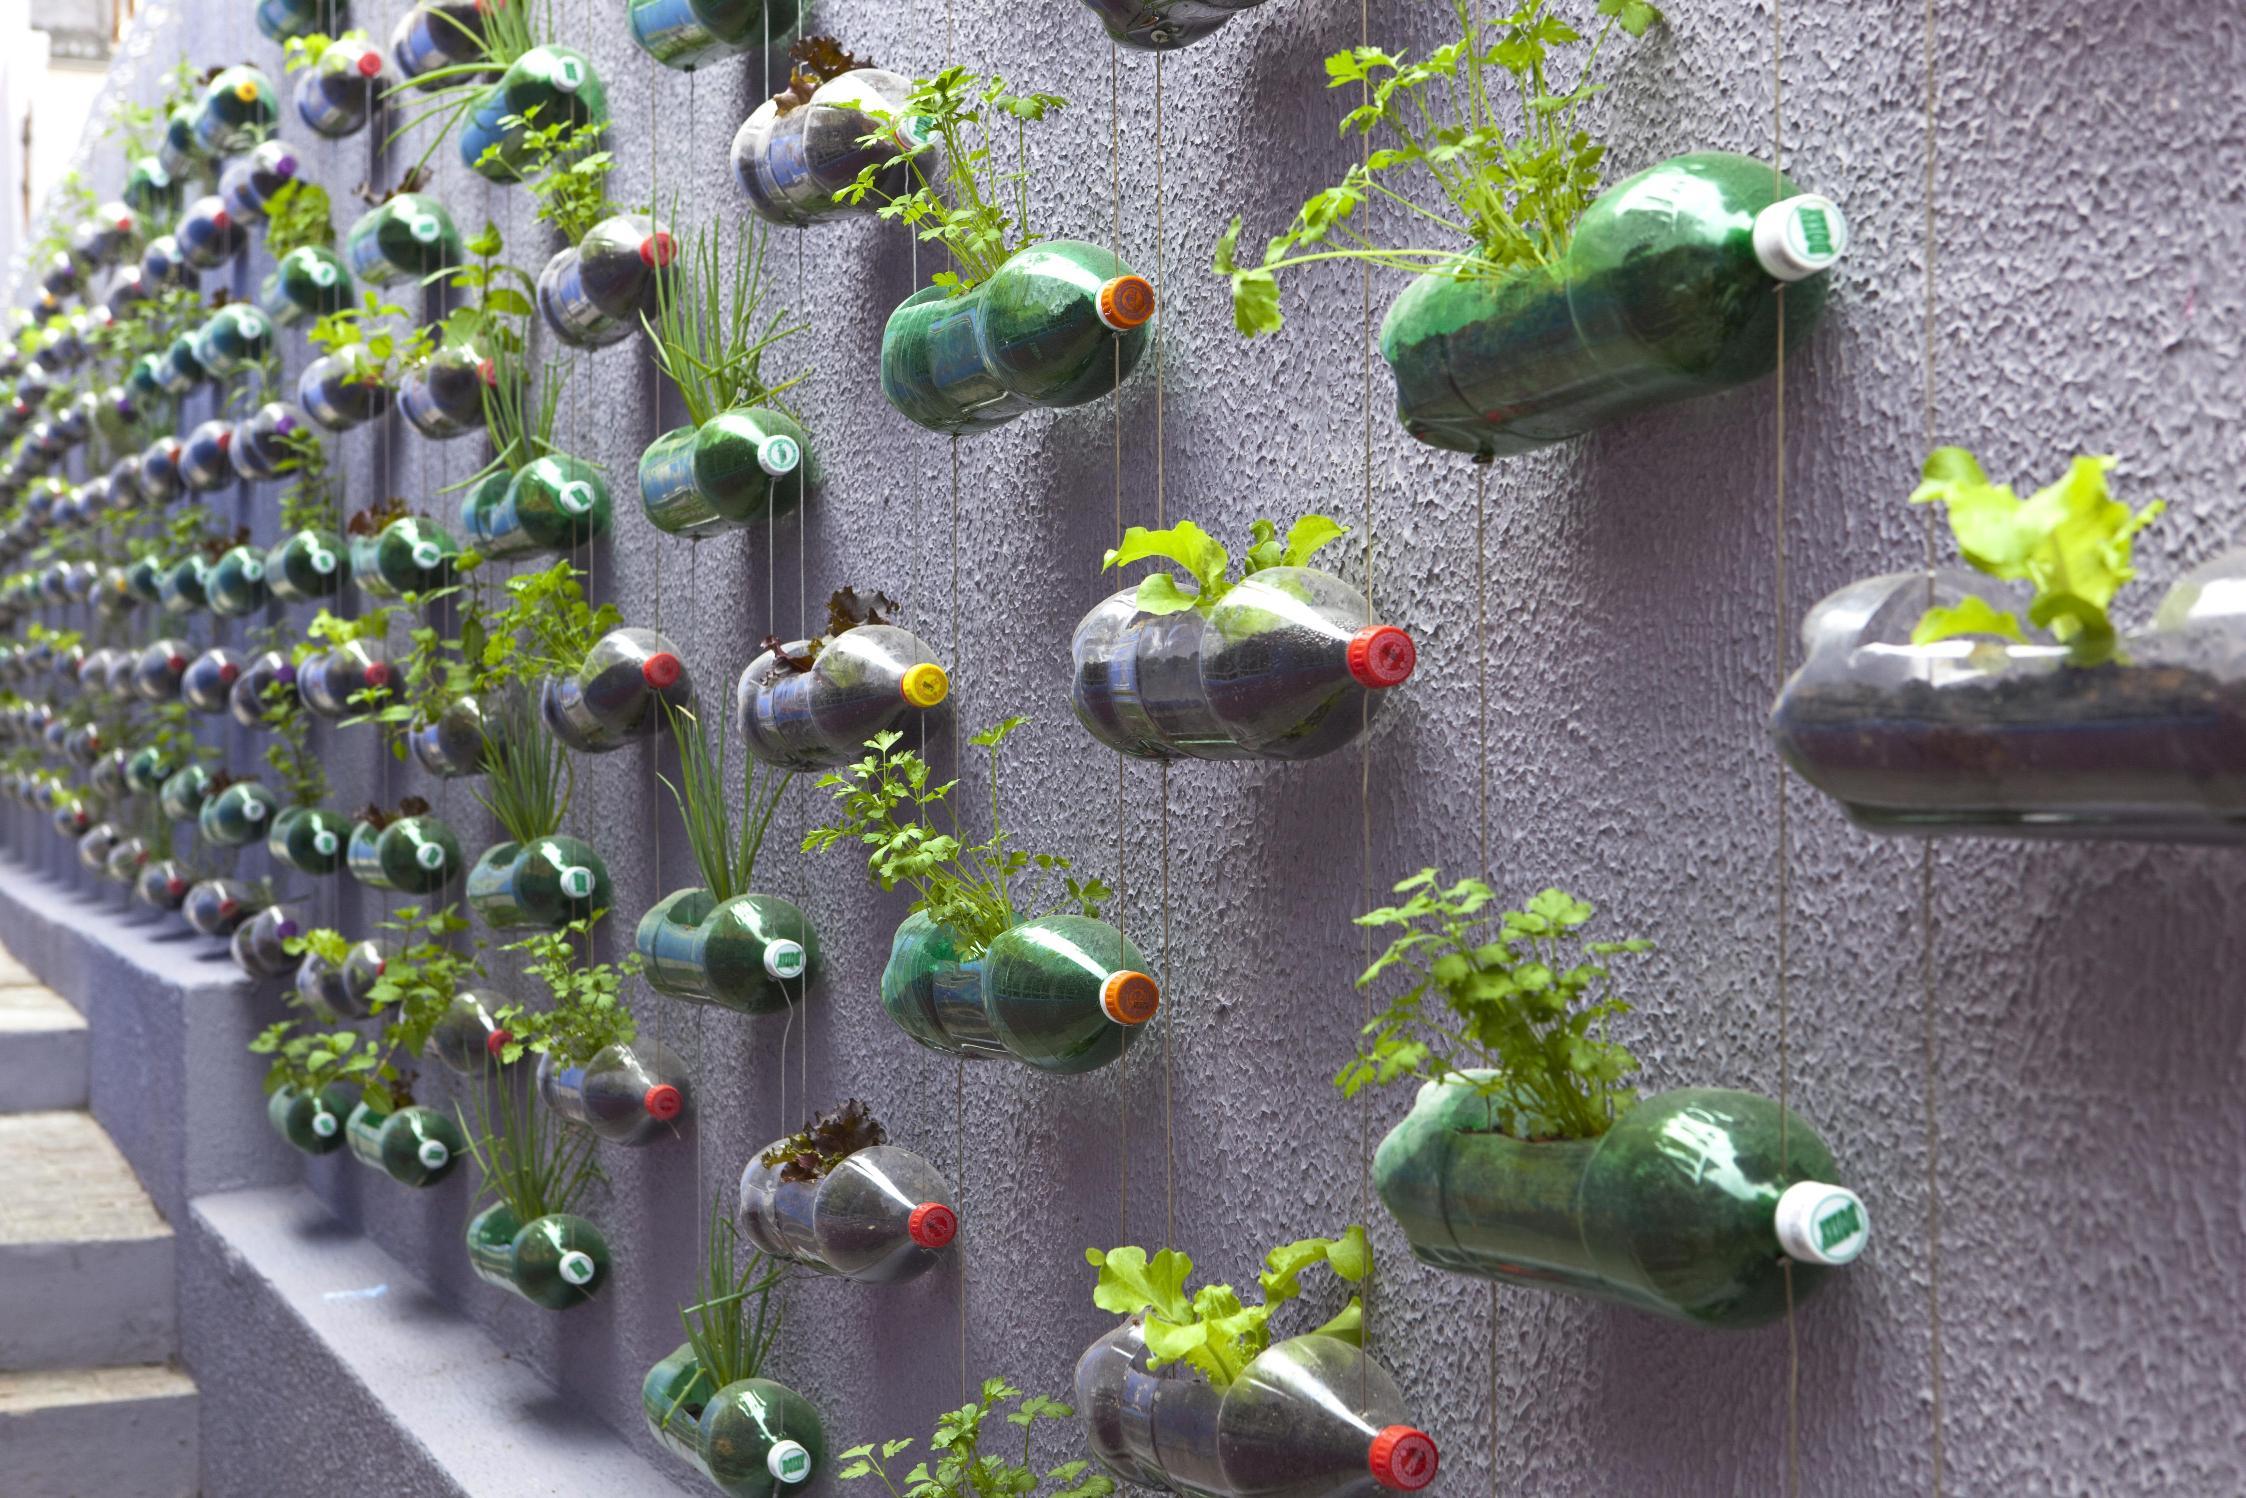 jardim vertical em garrafas pet